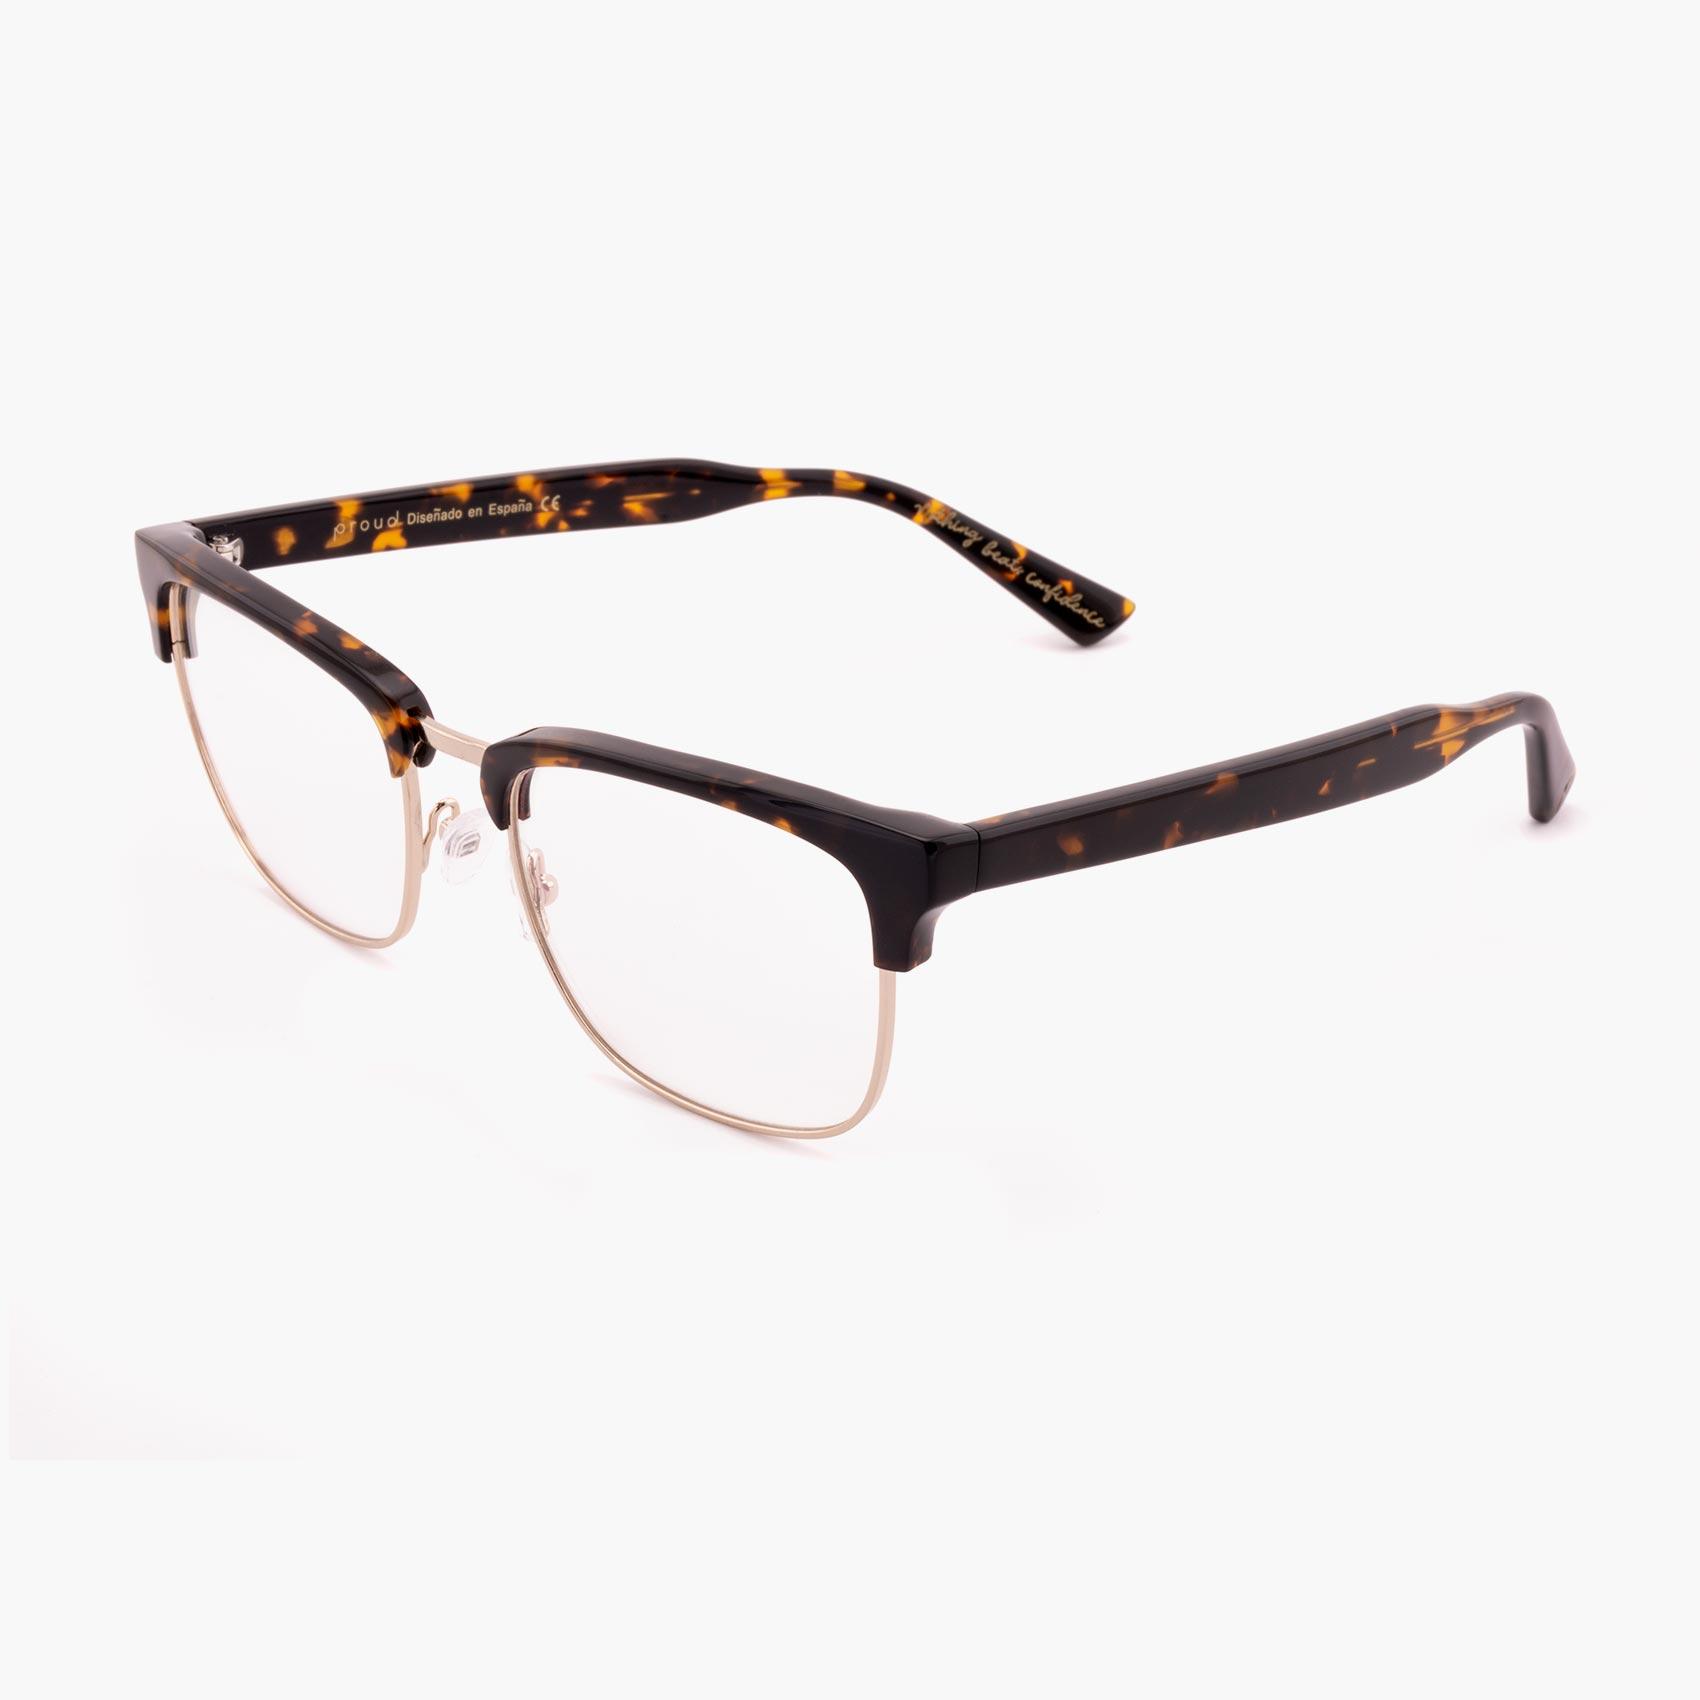 Proud eyewear Hopkins C1 P clubmaster glasses havana